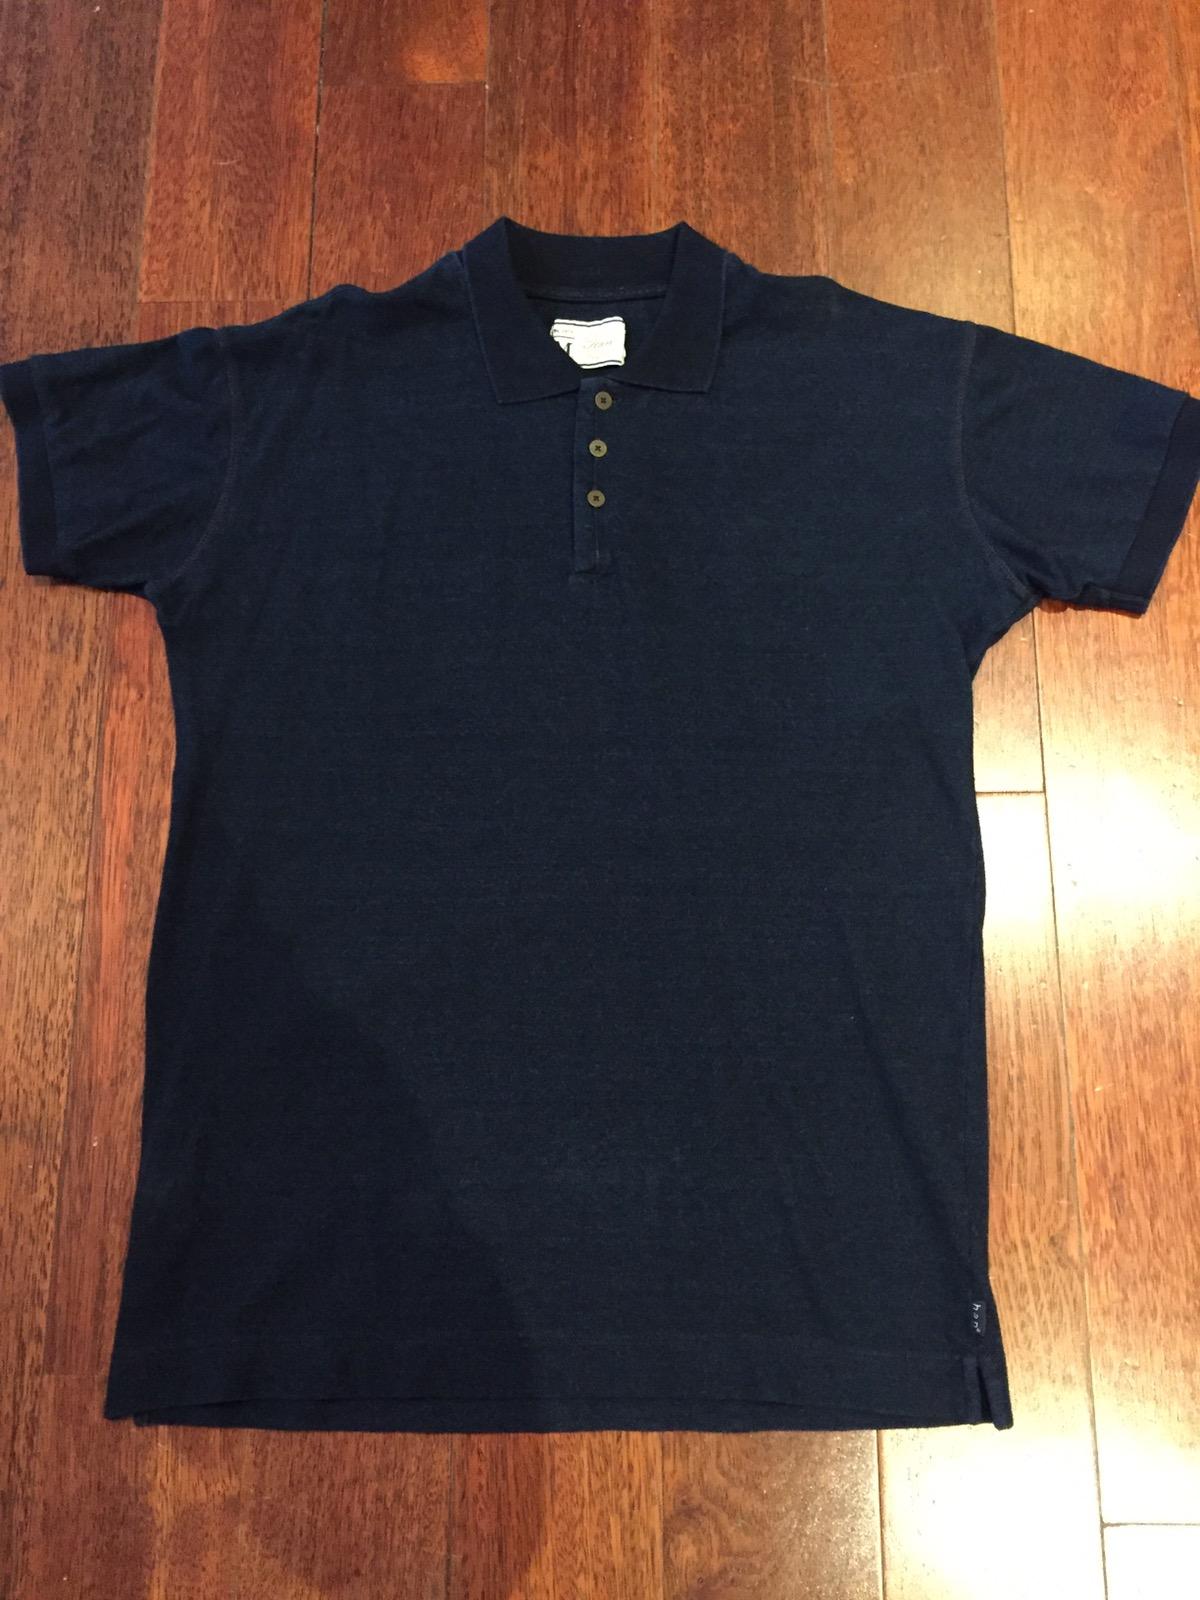 6a3d4ed609 Han Kjobenhavn 50's Polo Shirt | Grailed